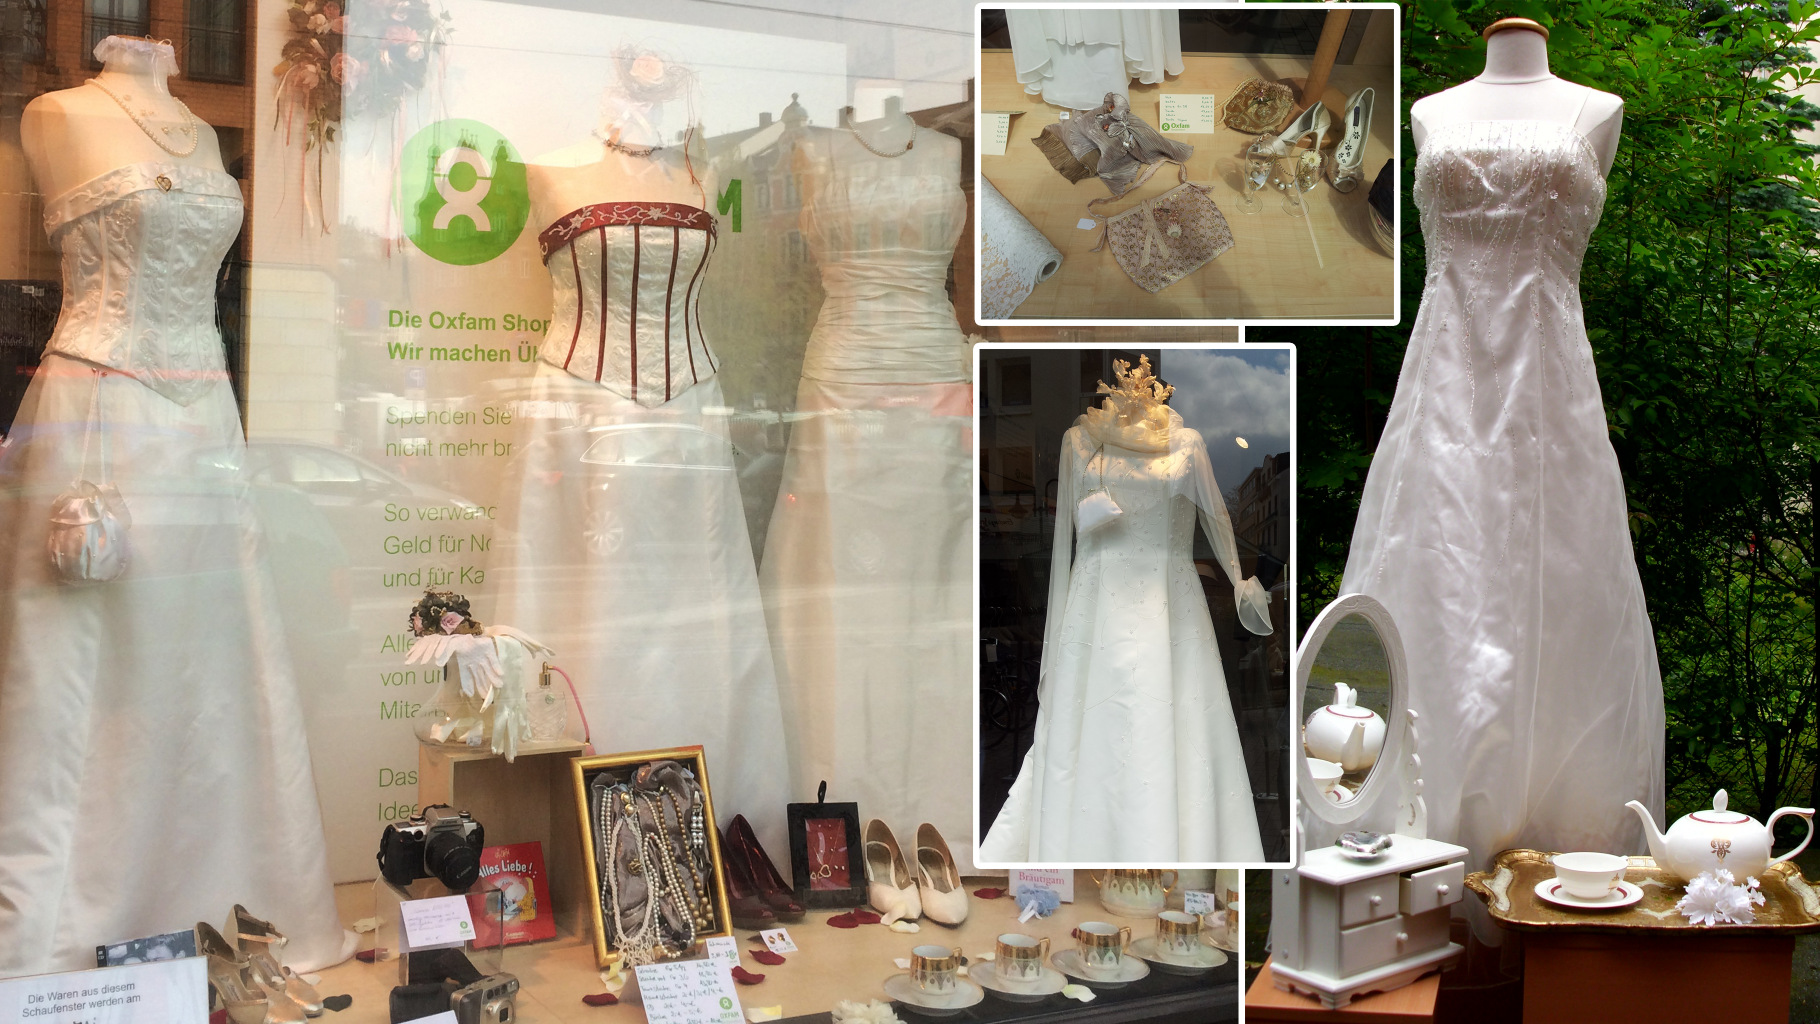 Brautmode im Oxfam Shop